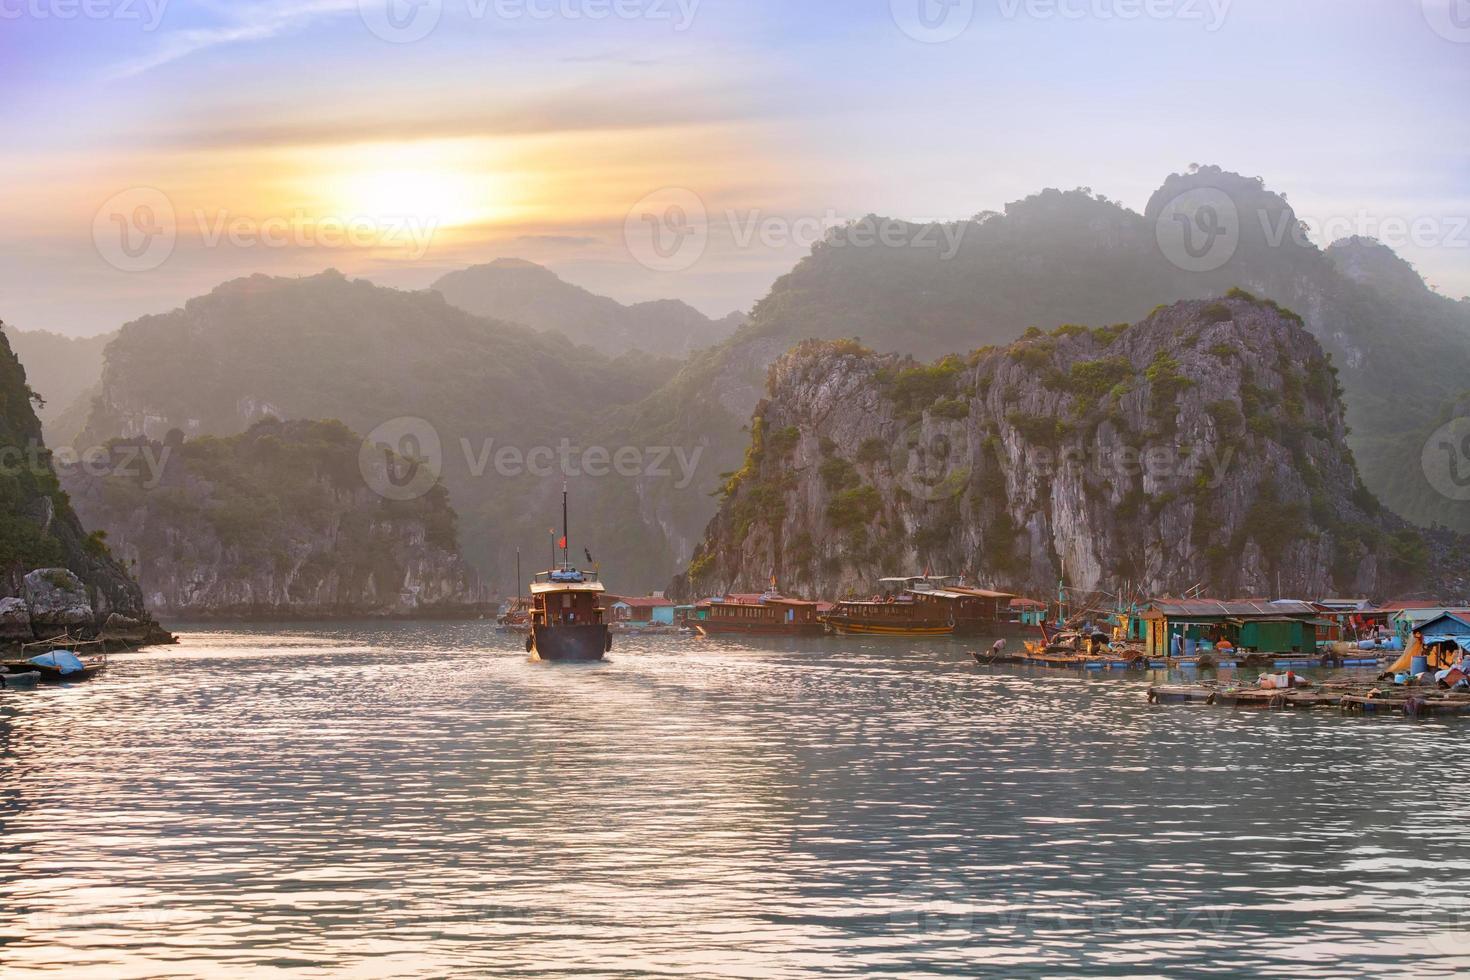 Sonnenuntergang am Meer in der Halong-Bucht foto